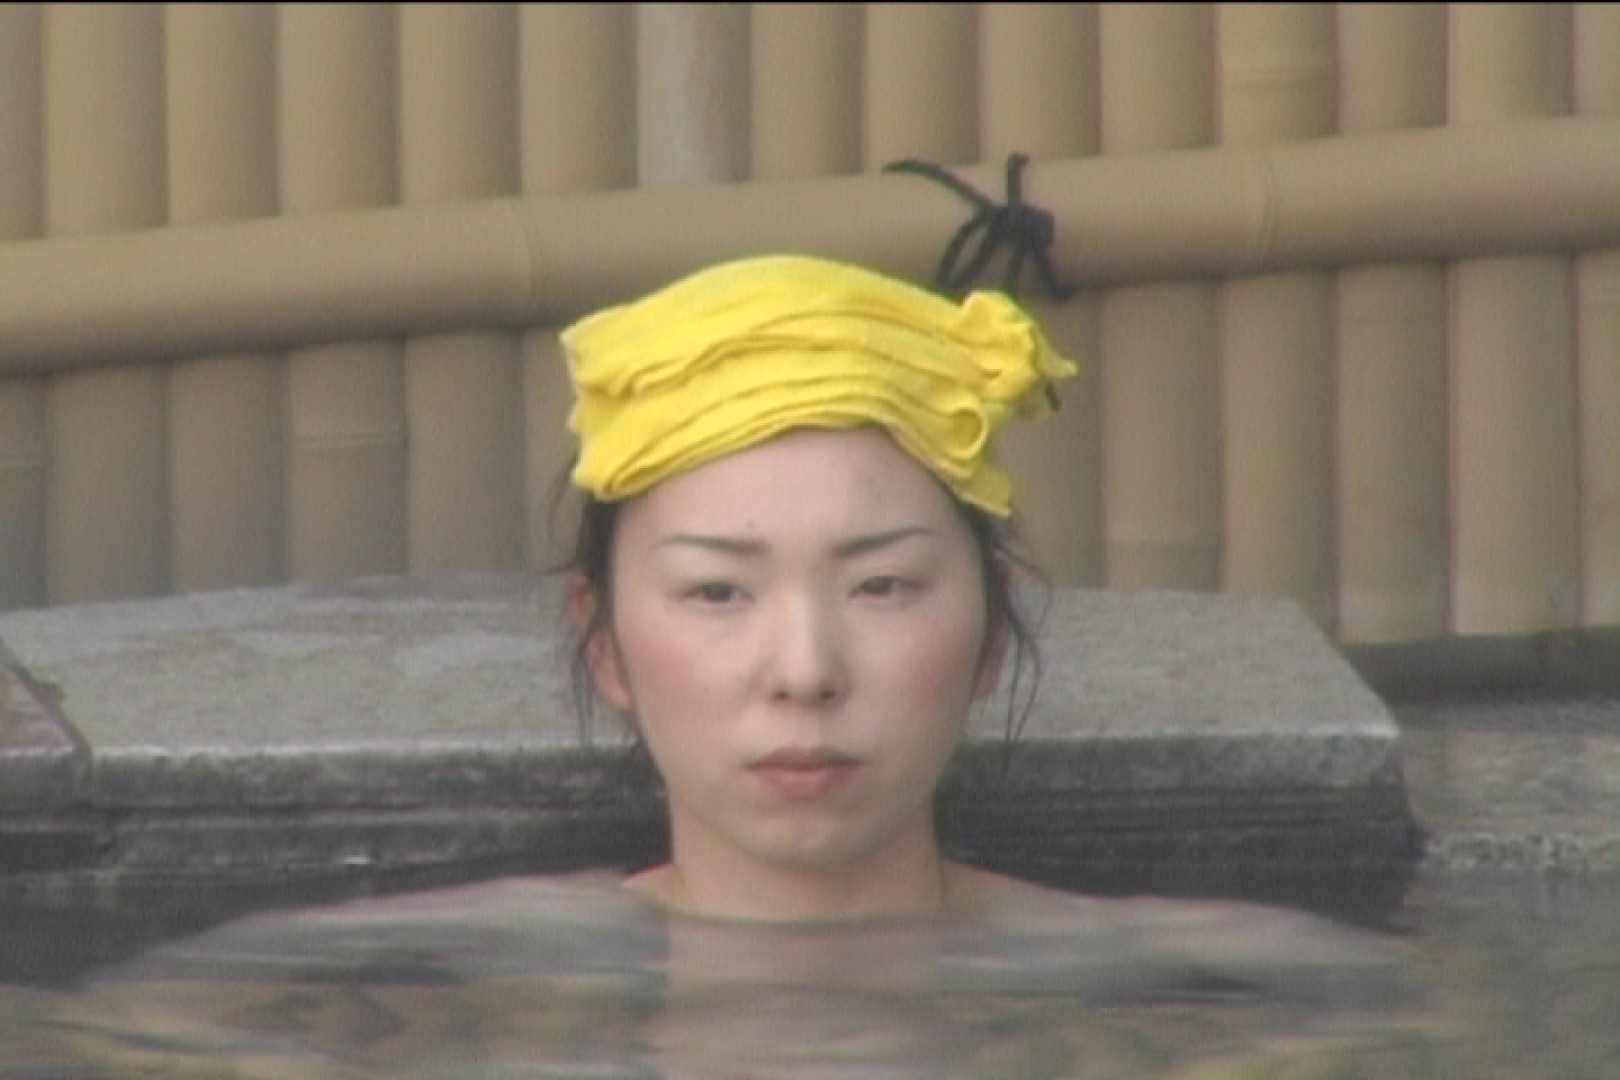 Aquaな露天風呂Vol.529 盗撮シリーズ | 露天風呂編  106PIX 35